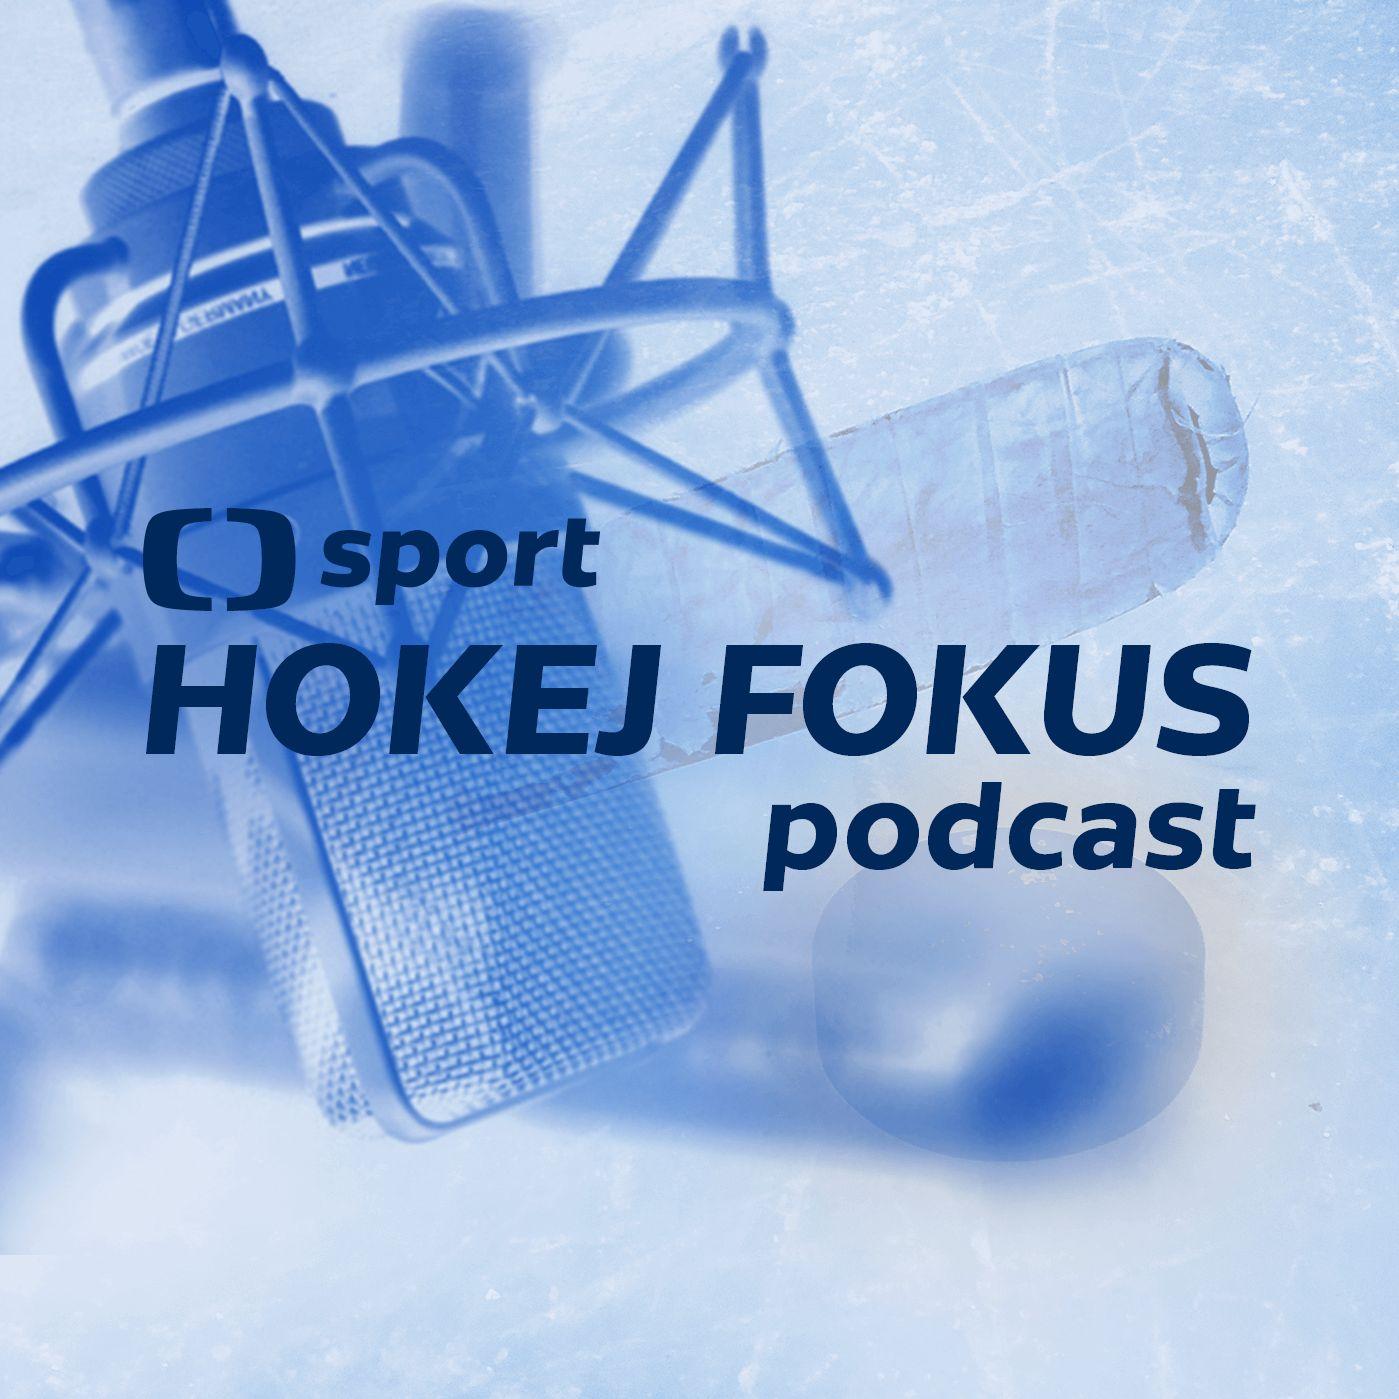 Hokej fokus podcast: Proč si Kometa zajistila titul a Jihlava postup do extraligy?